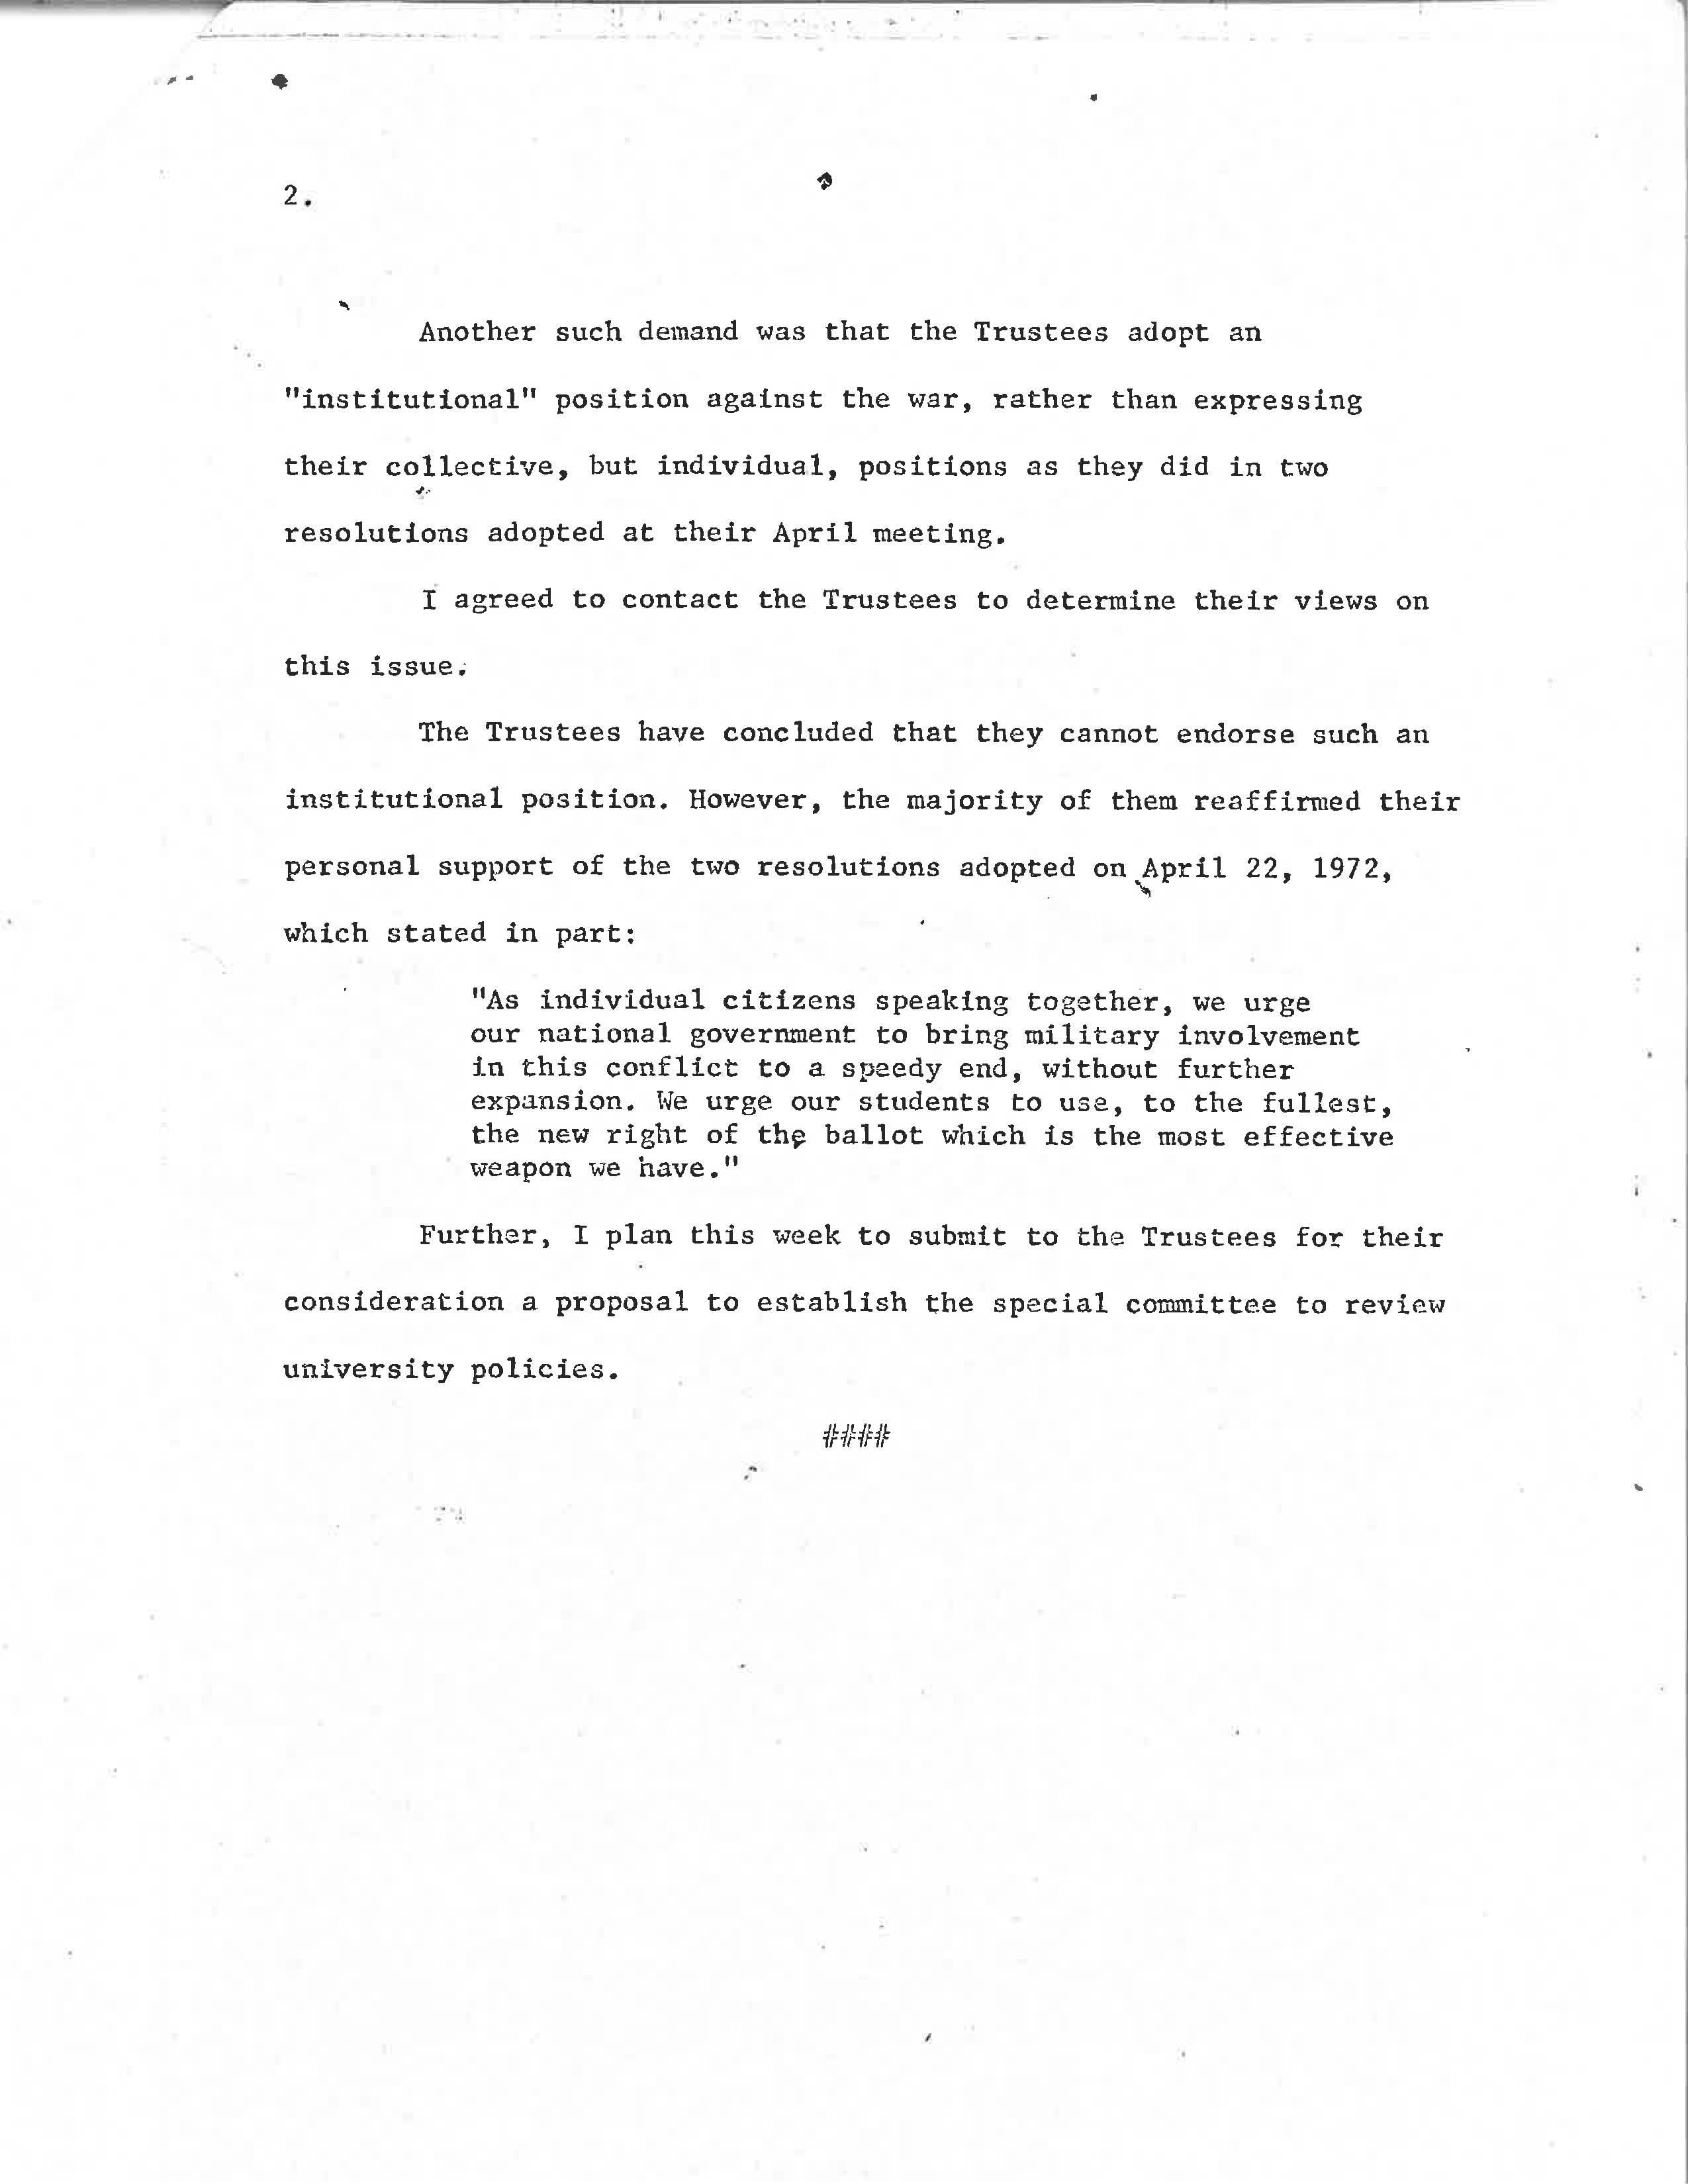 President Wharton Statement on Anti-War Demands, Page 2